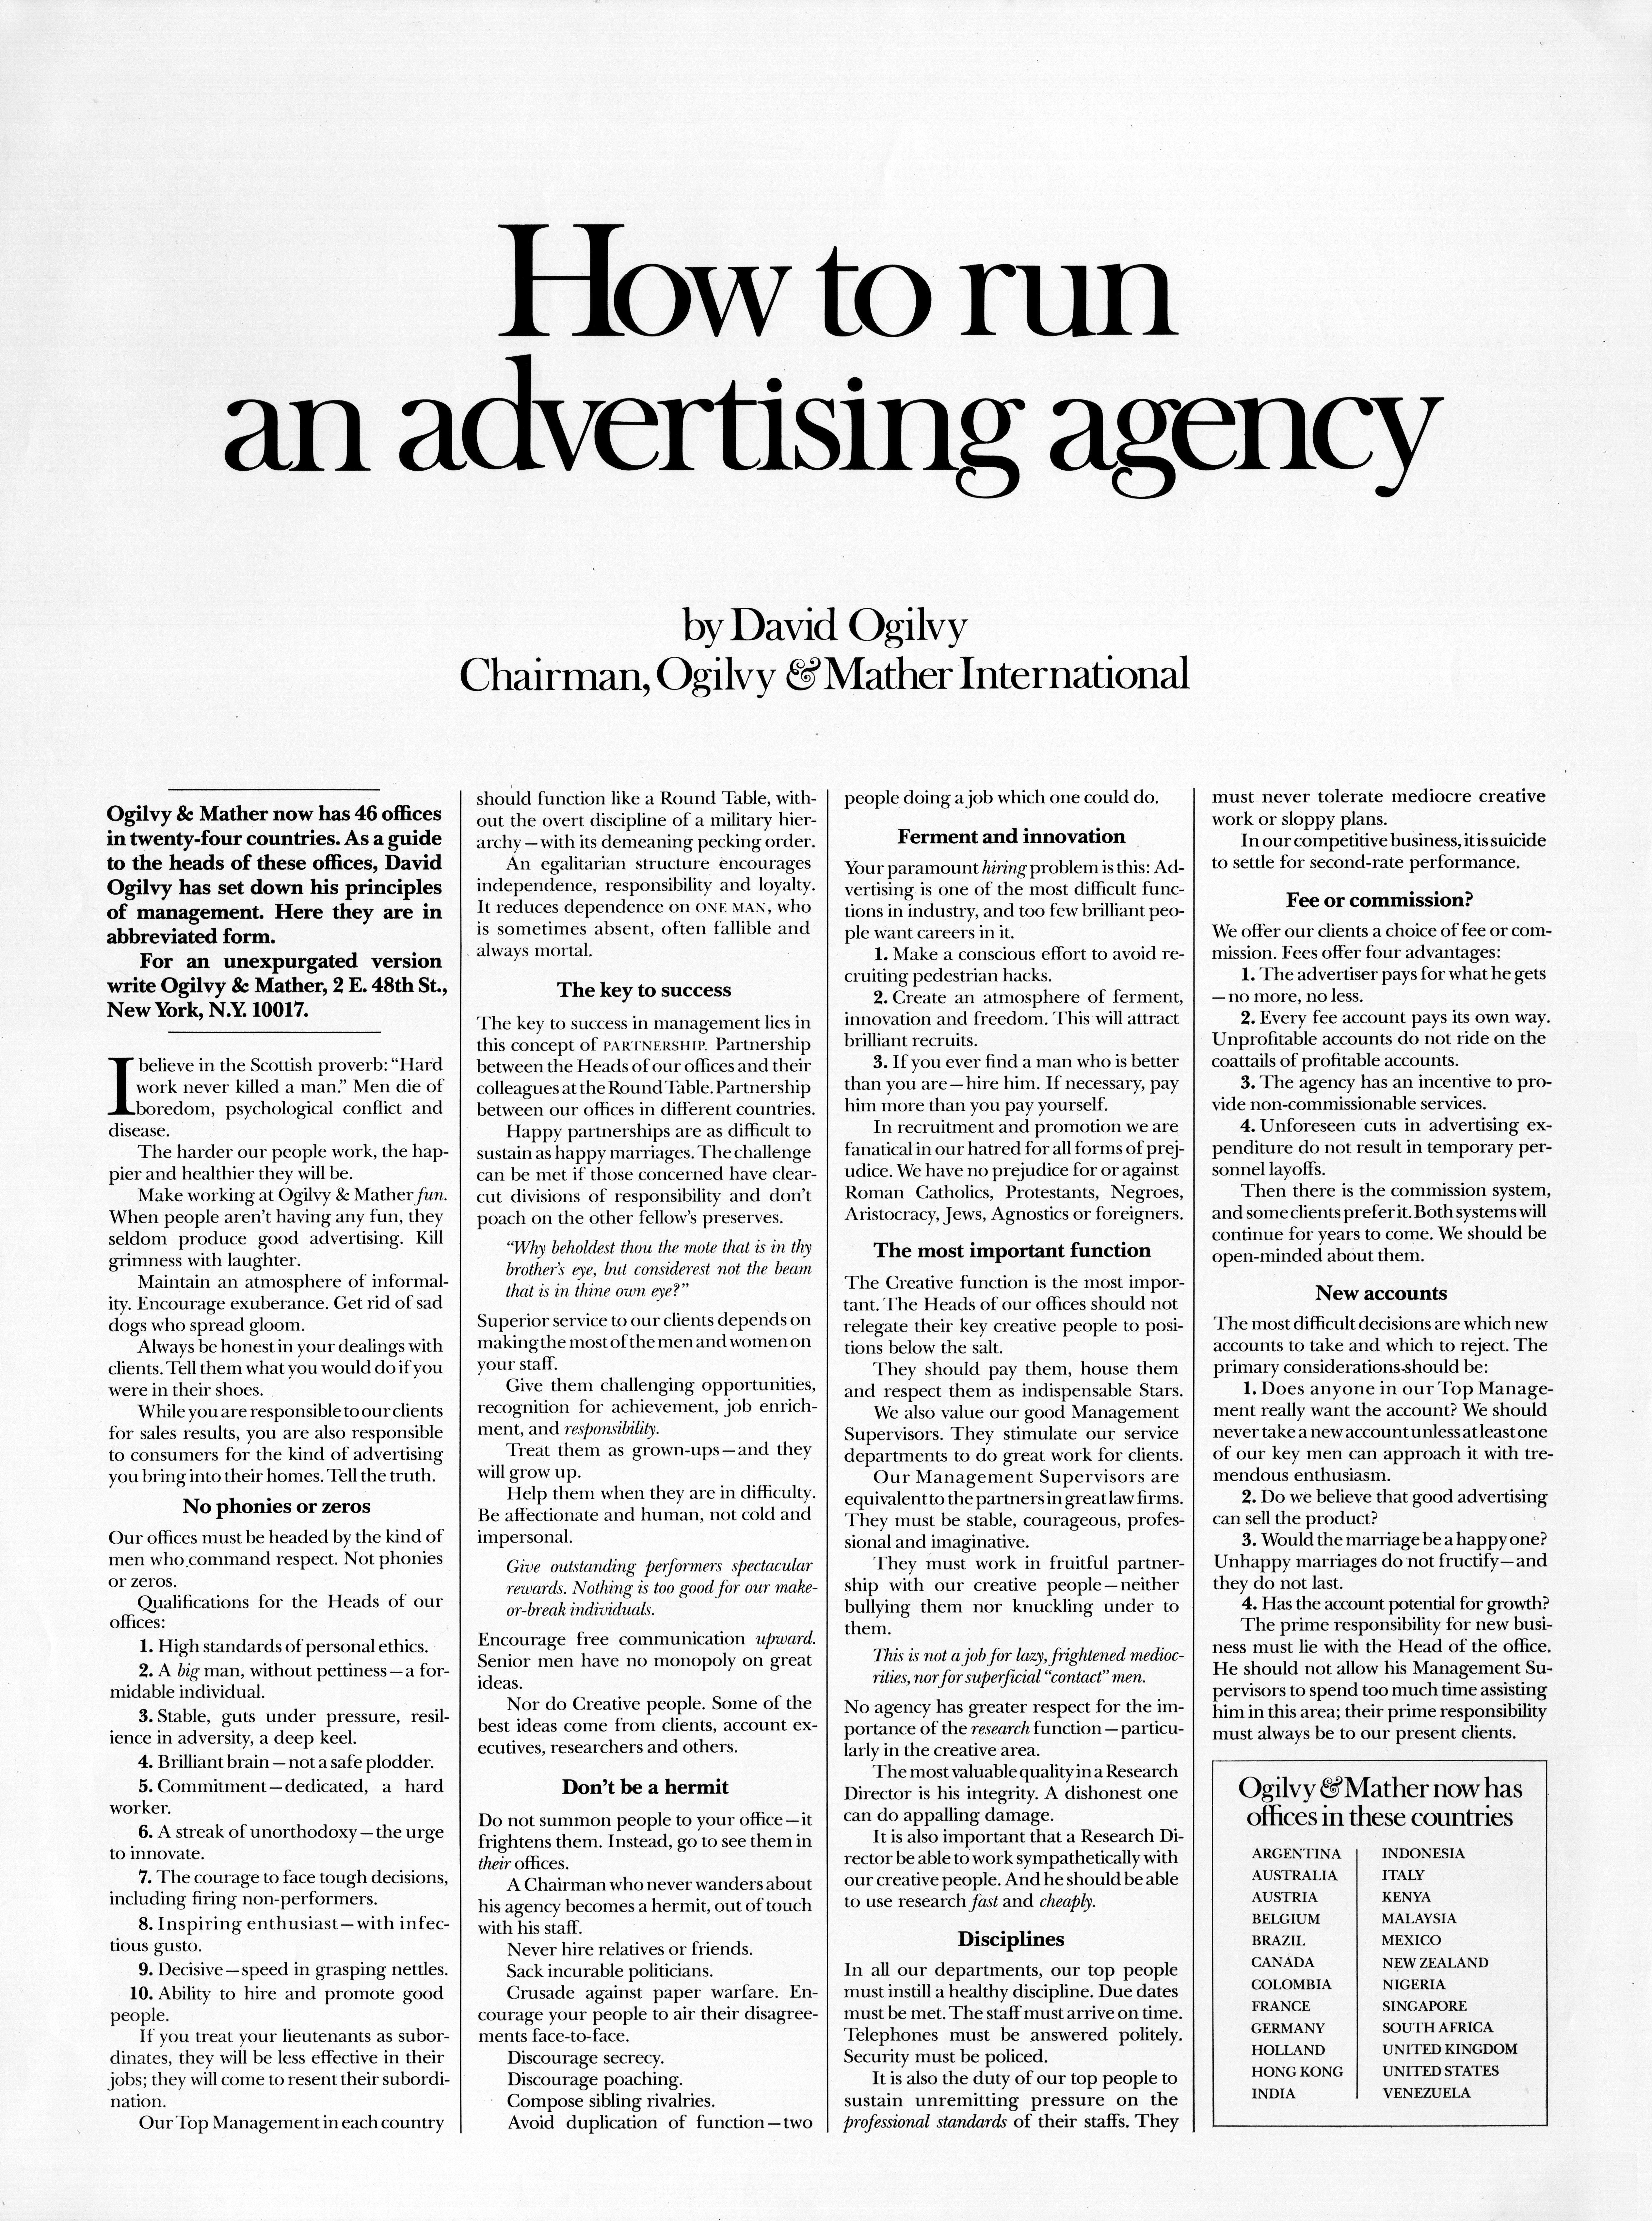 How To Run An Advertising Agency By David Ogilvy Marketing